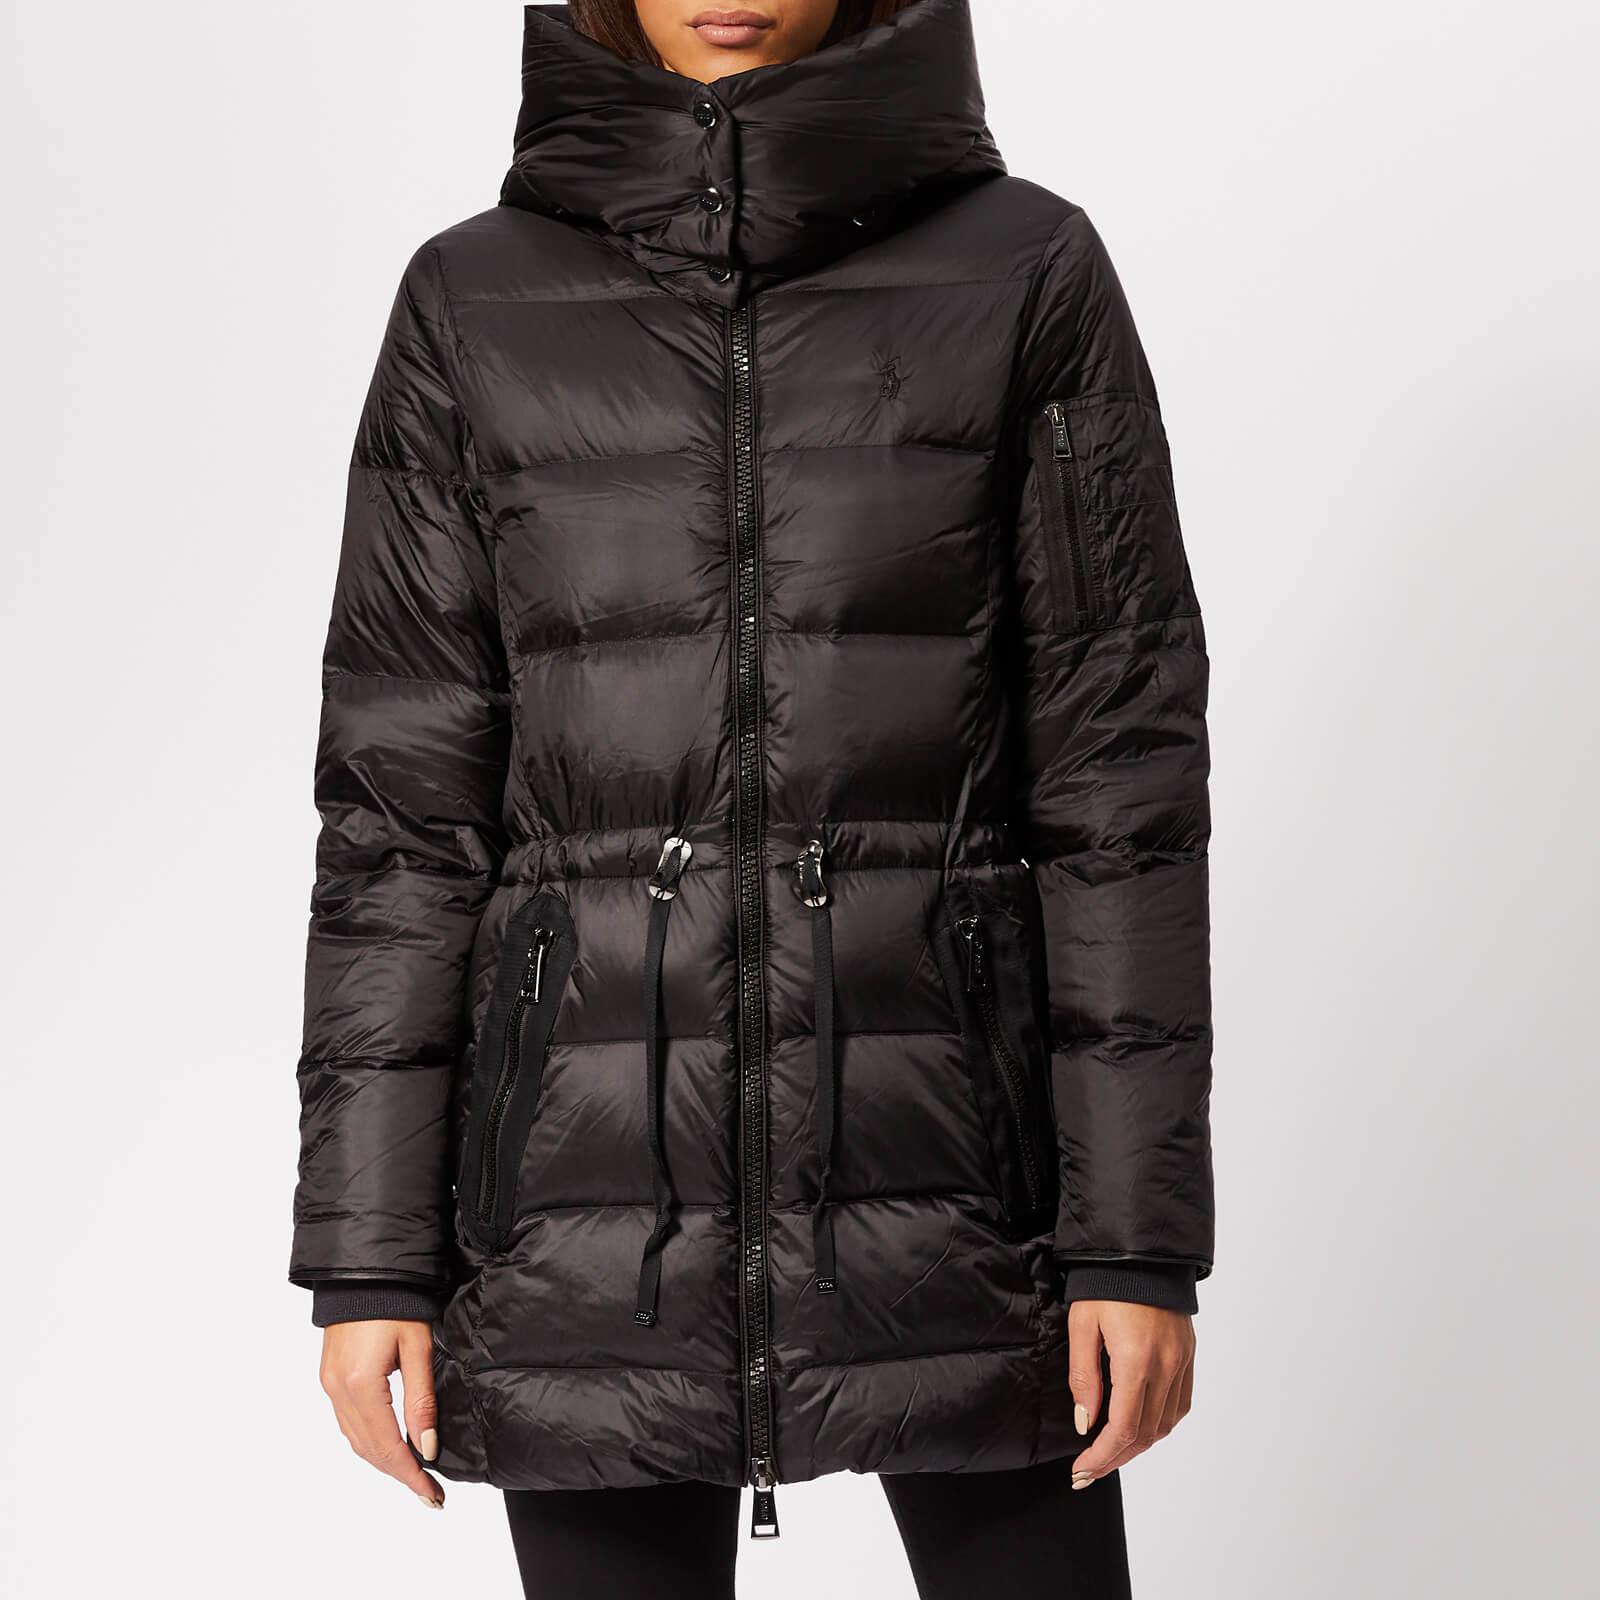 Long Polo Down Coat Black Ralph Lauren Women's SzMVUpq